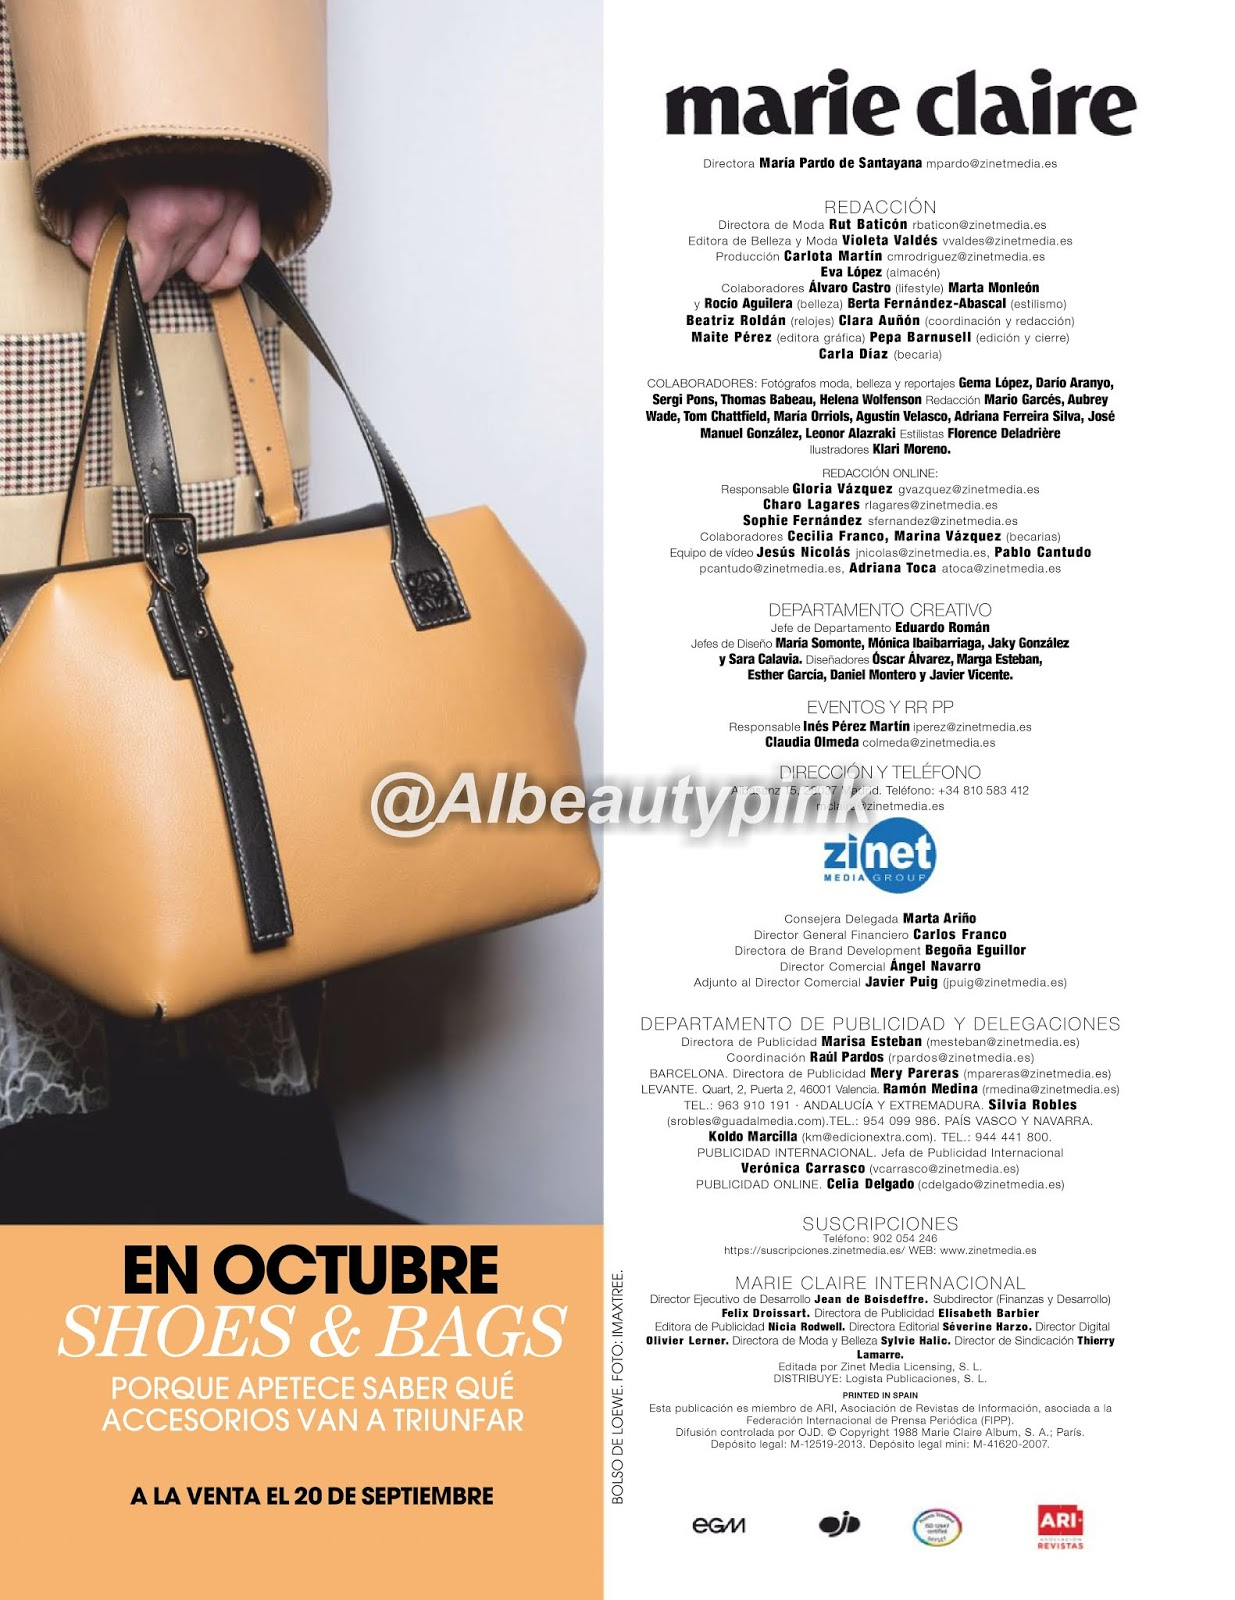 avance regalo revista octubre 2019 marie claire shoes and bags